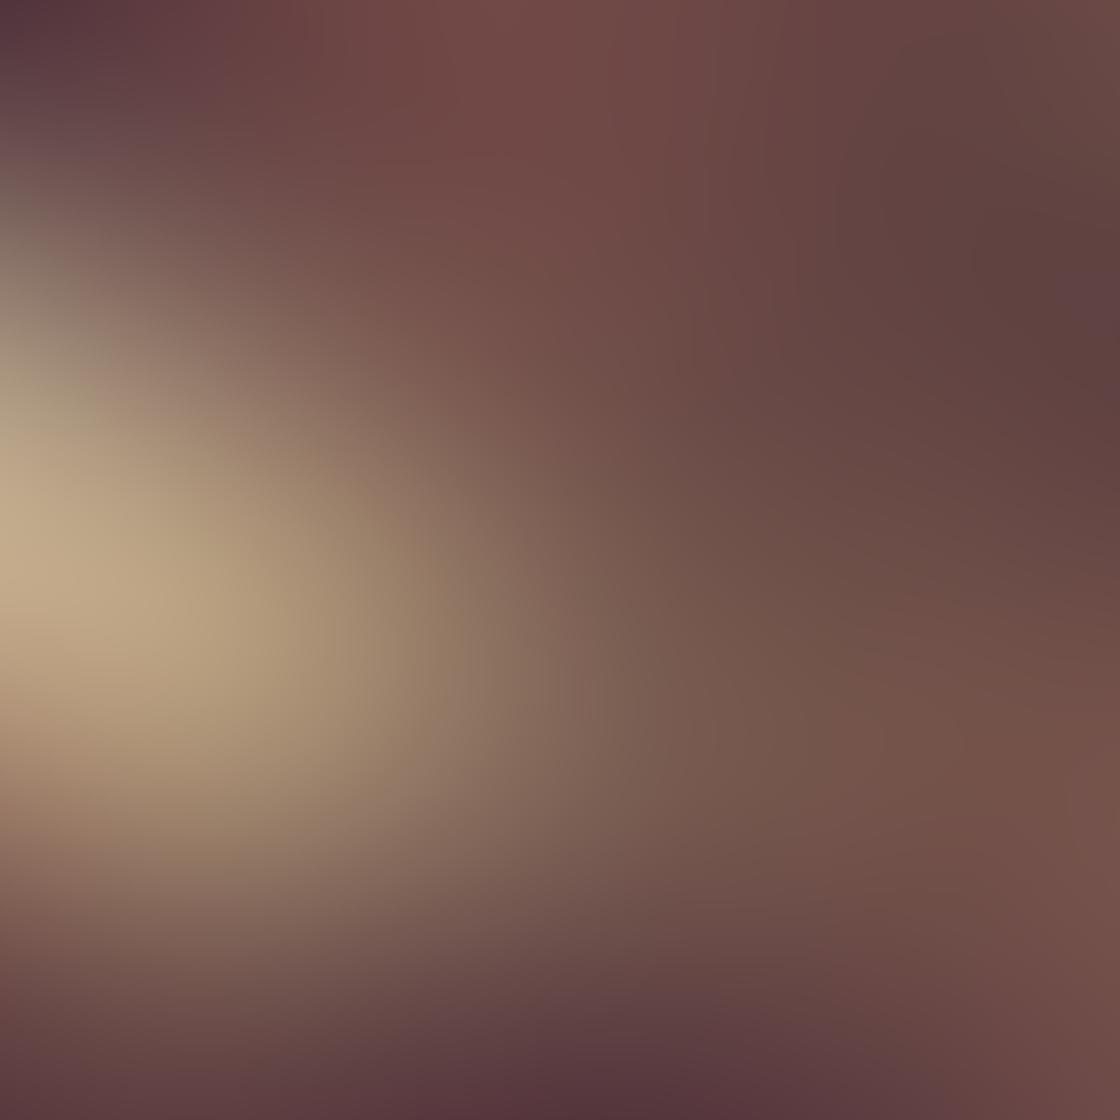 iPhone Portrait Photography 18